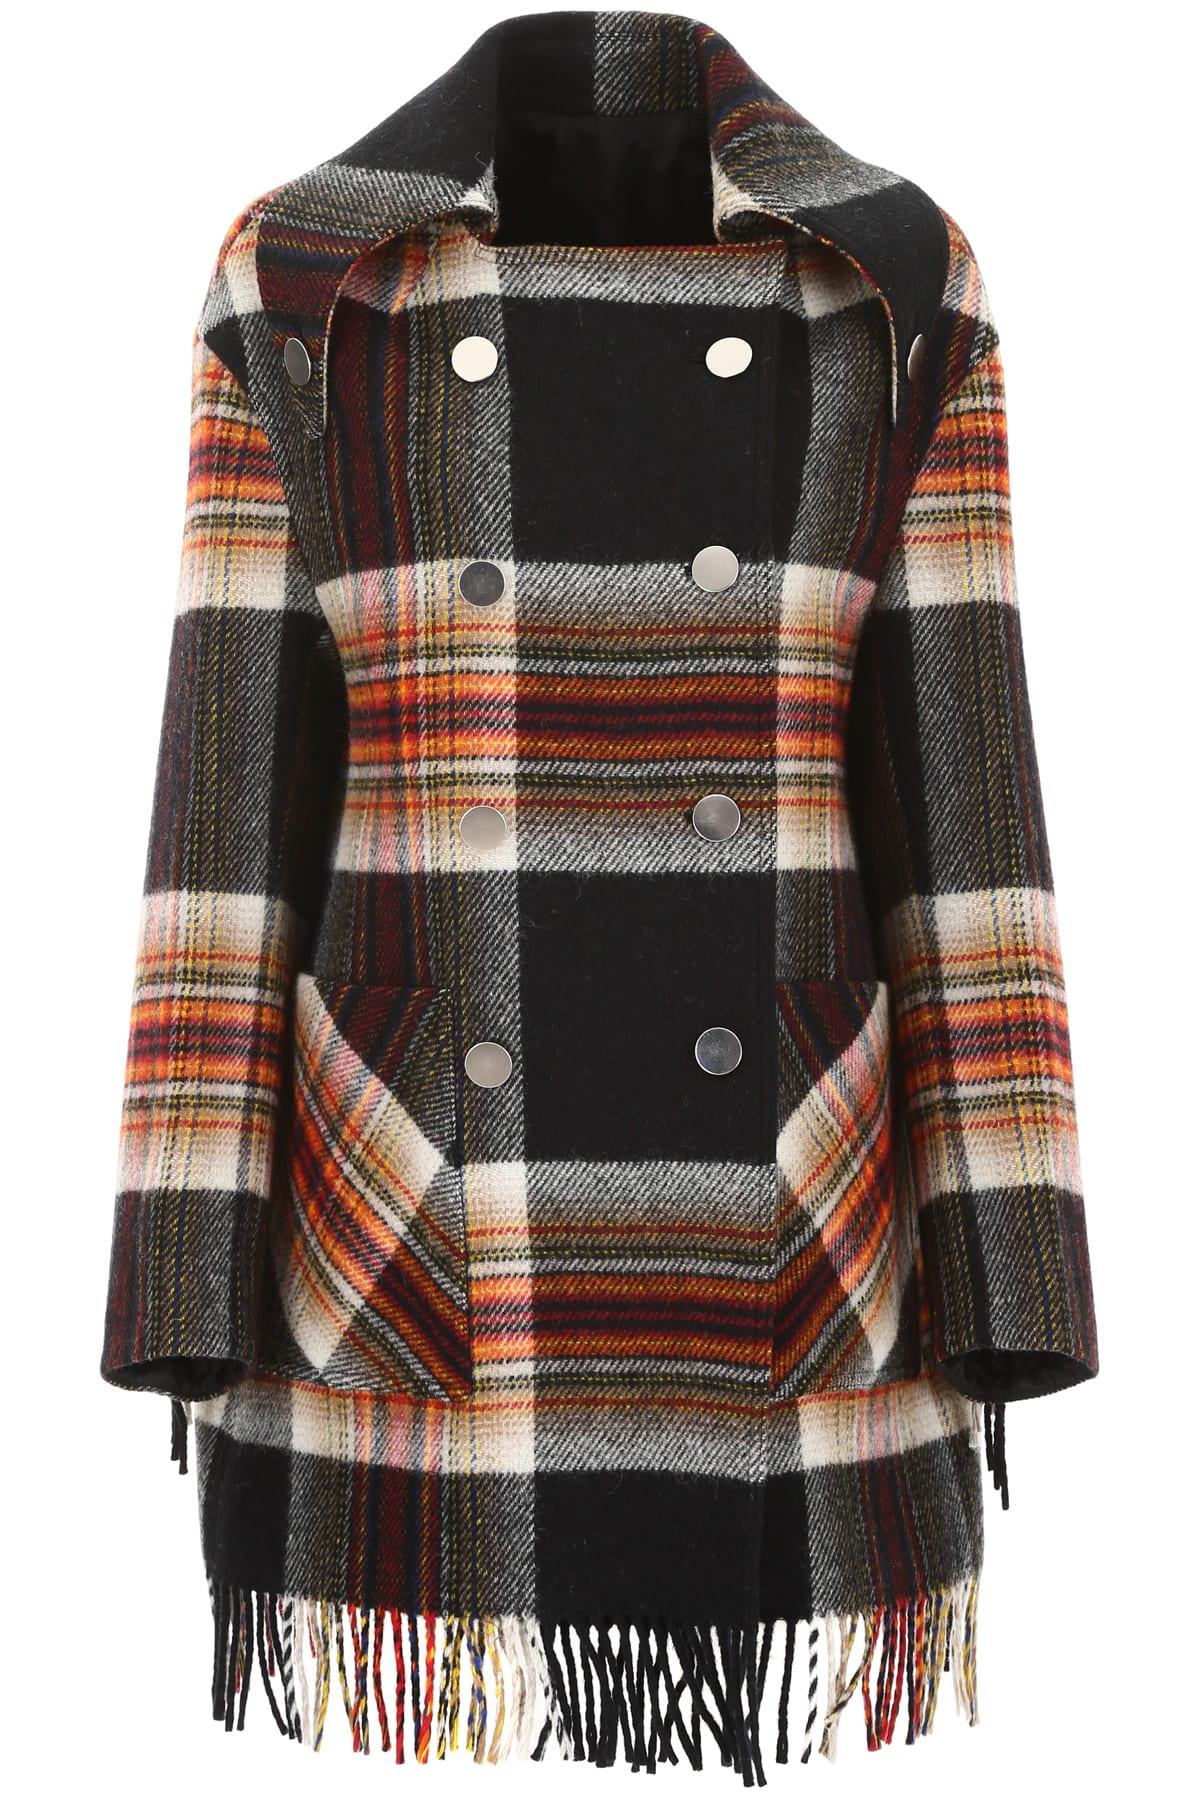 Calvin Klein Pendelton Coat